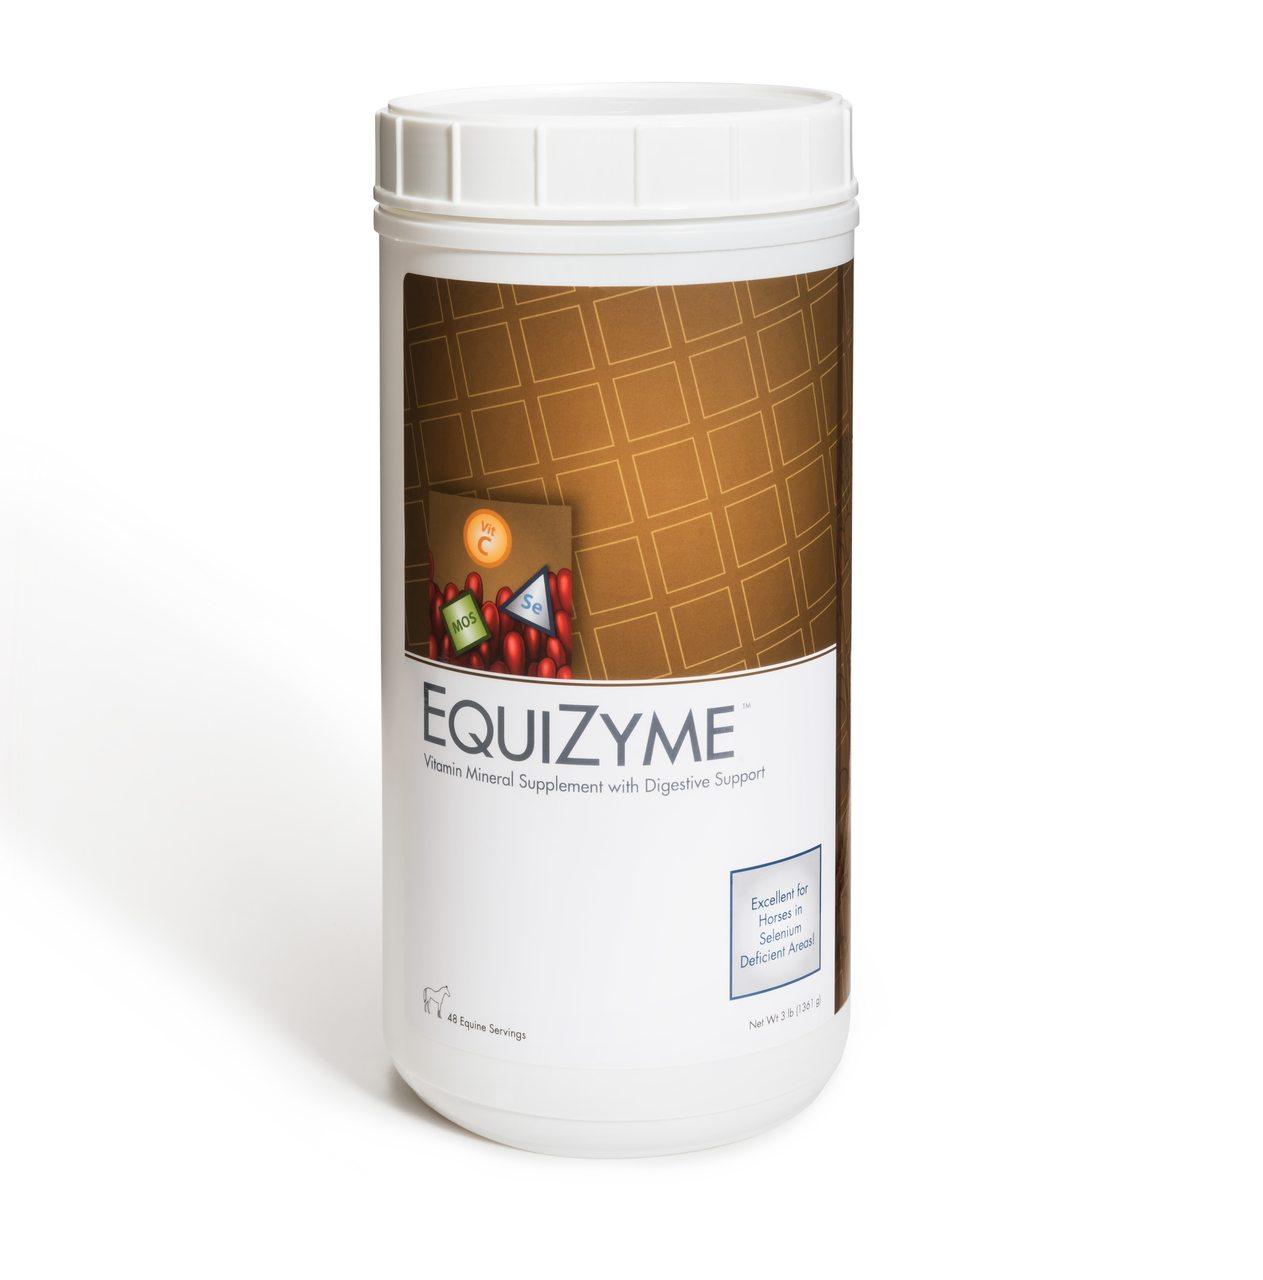 EquiZyme